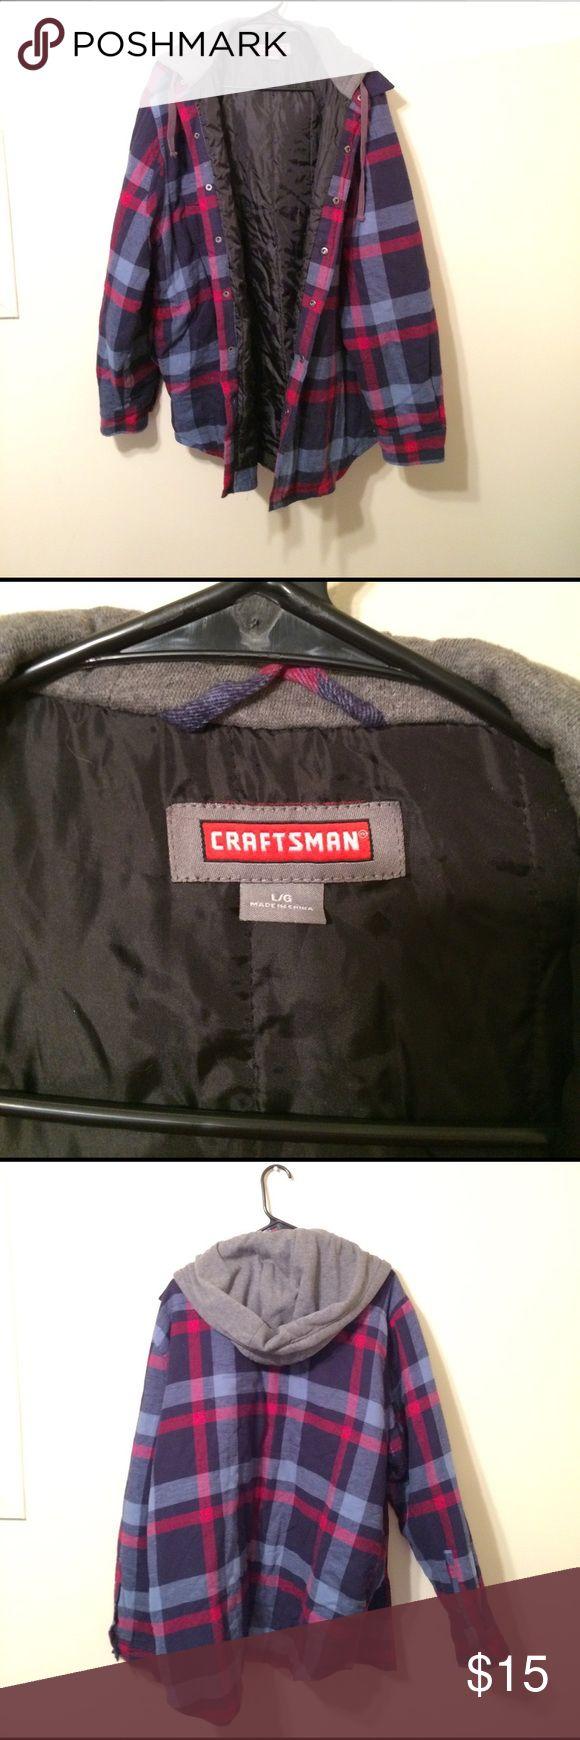 Craftsman plaid jacket with hood Craftsman red and blue plaid jacket with grey hood. Very warm. Jackets & Coats Bomber & Varsity